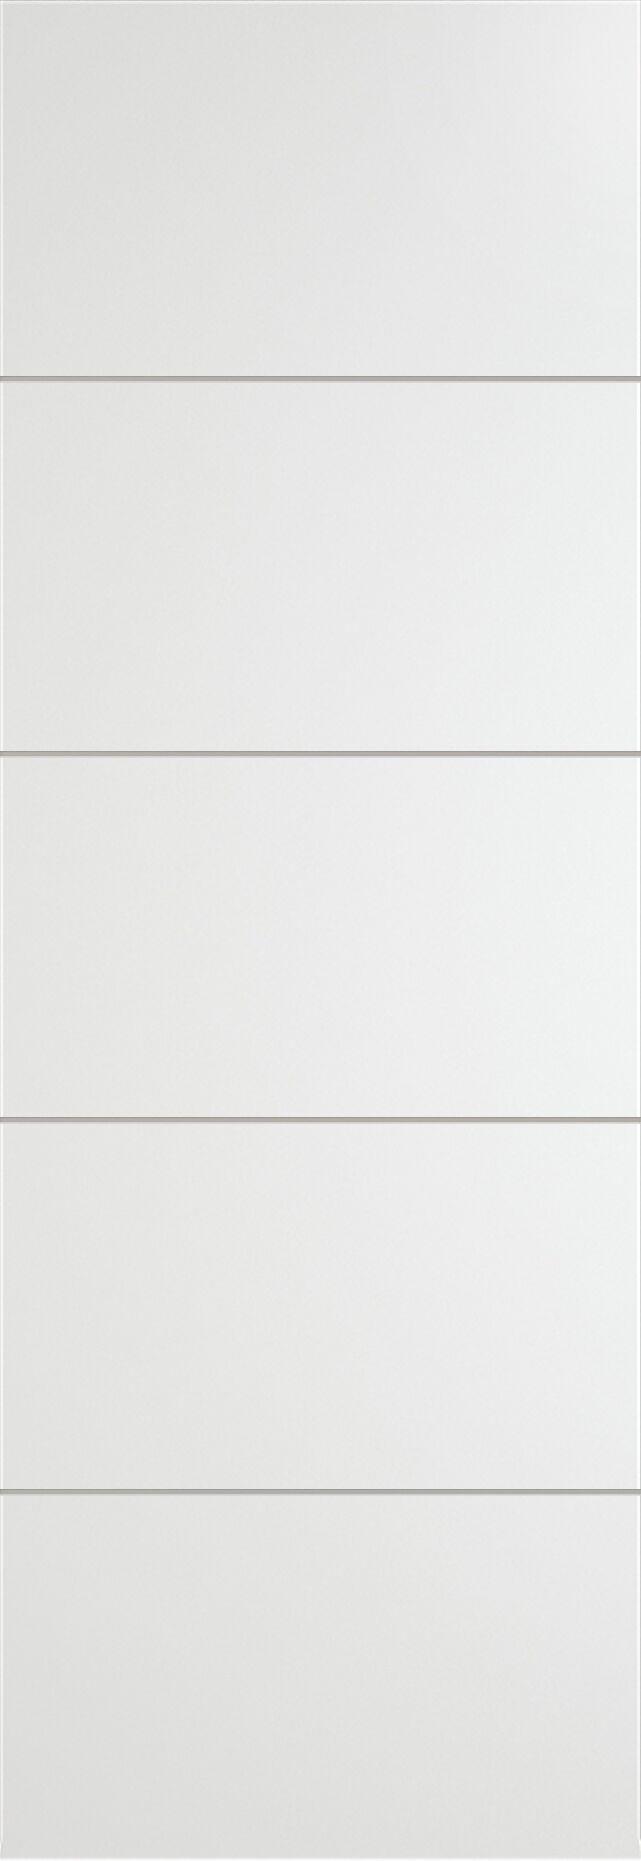 Tivoli Д-2 Invisible цвет - Белая эмаль Без стекла (ДГ)